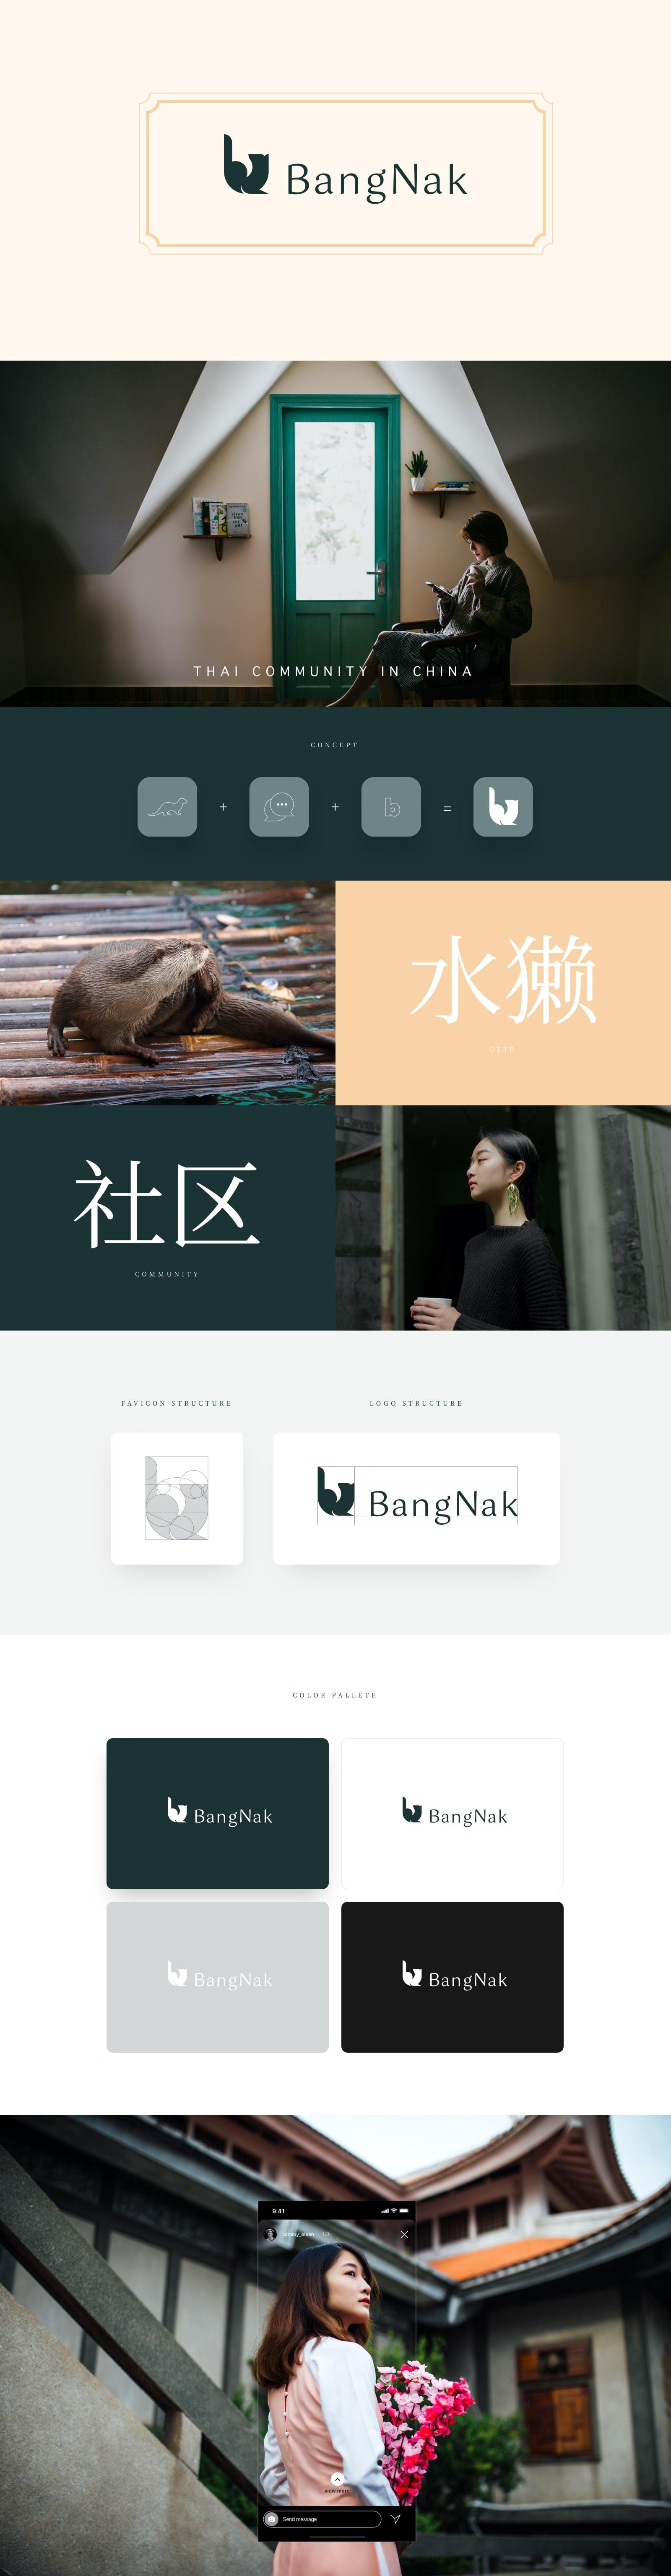 KOS Design - BangNak